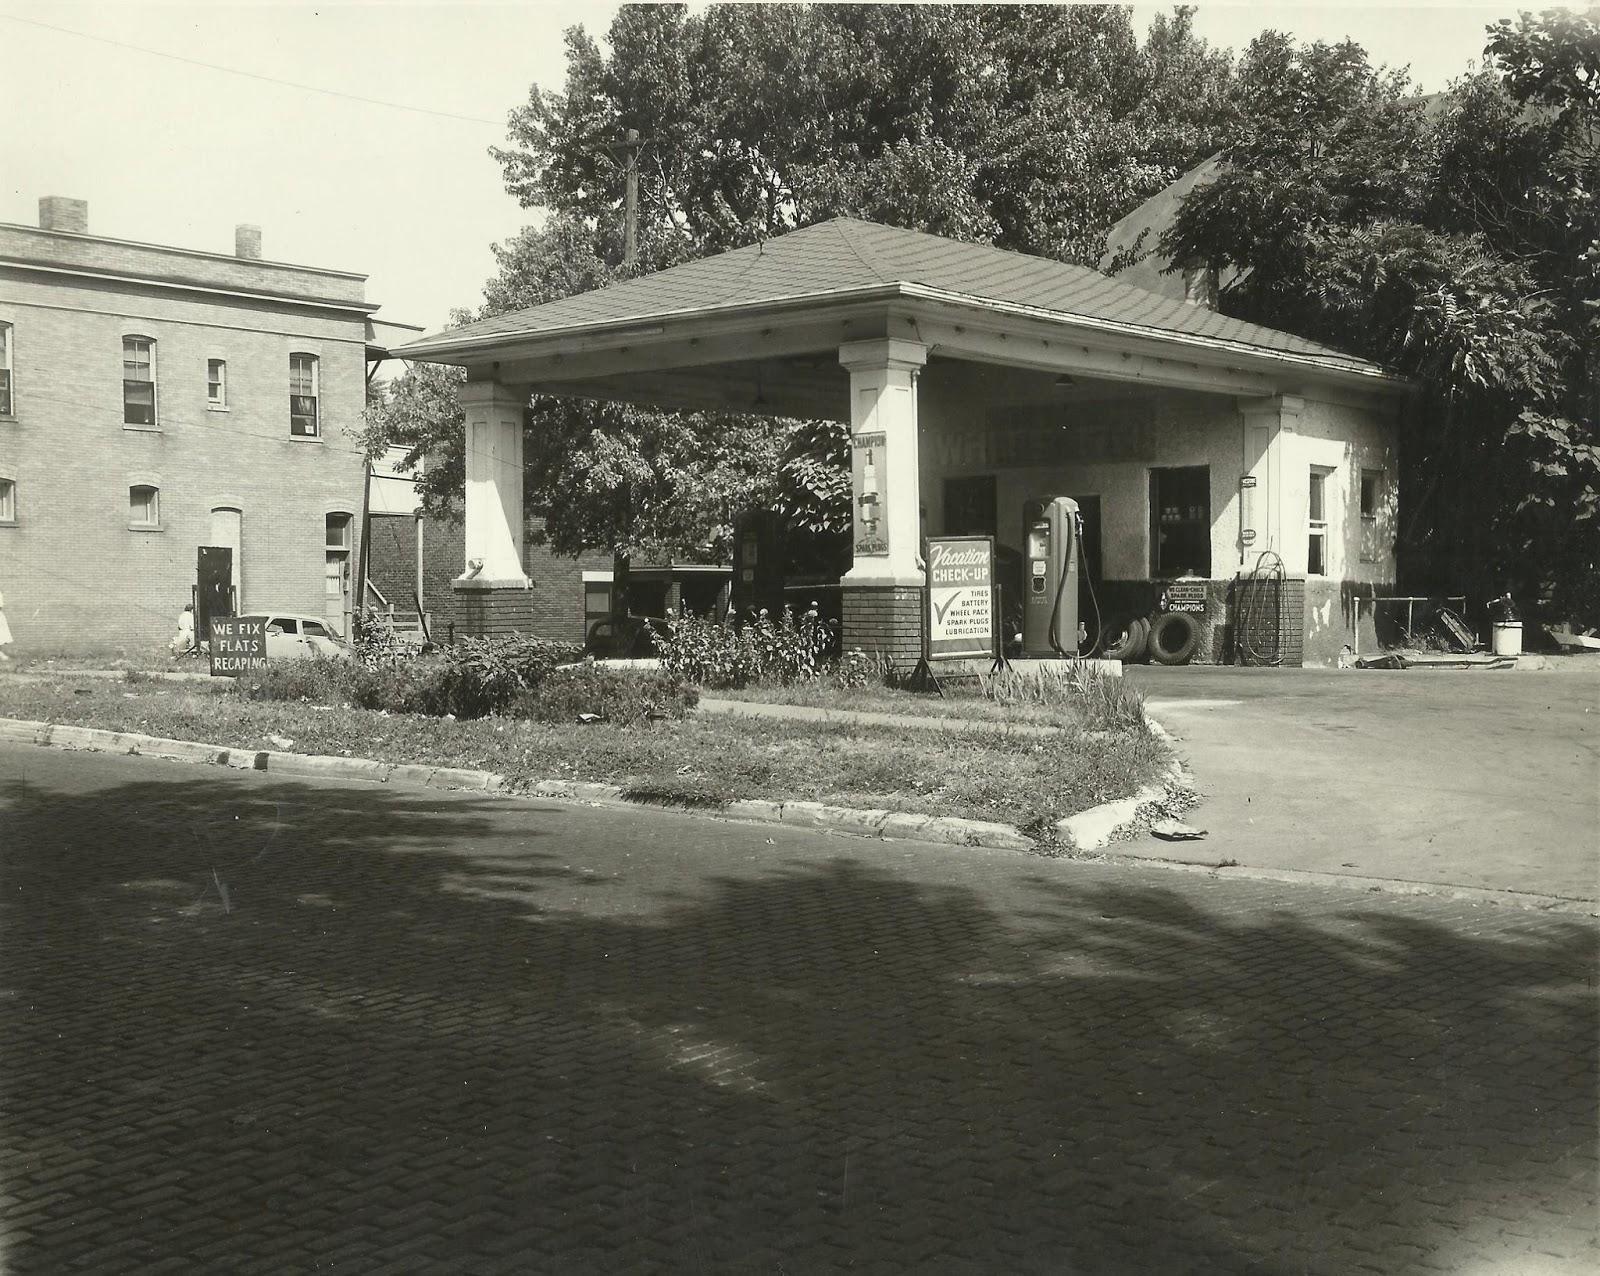 Phillips 66, North 40th and Hamilton Street, North Omaha, Nebraska